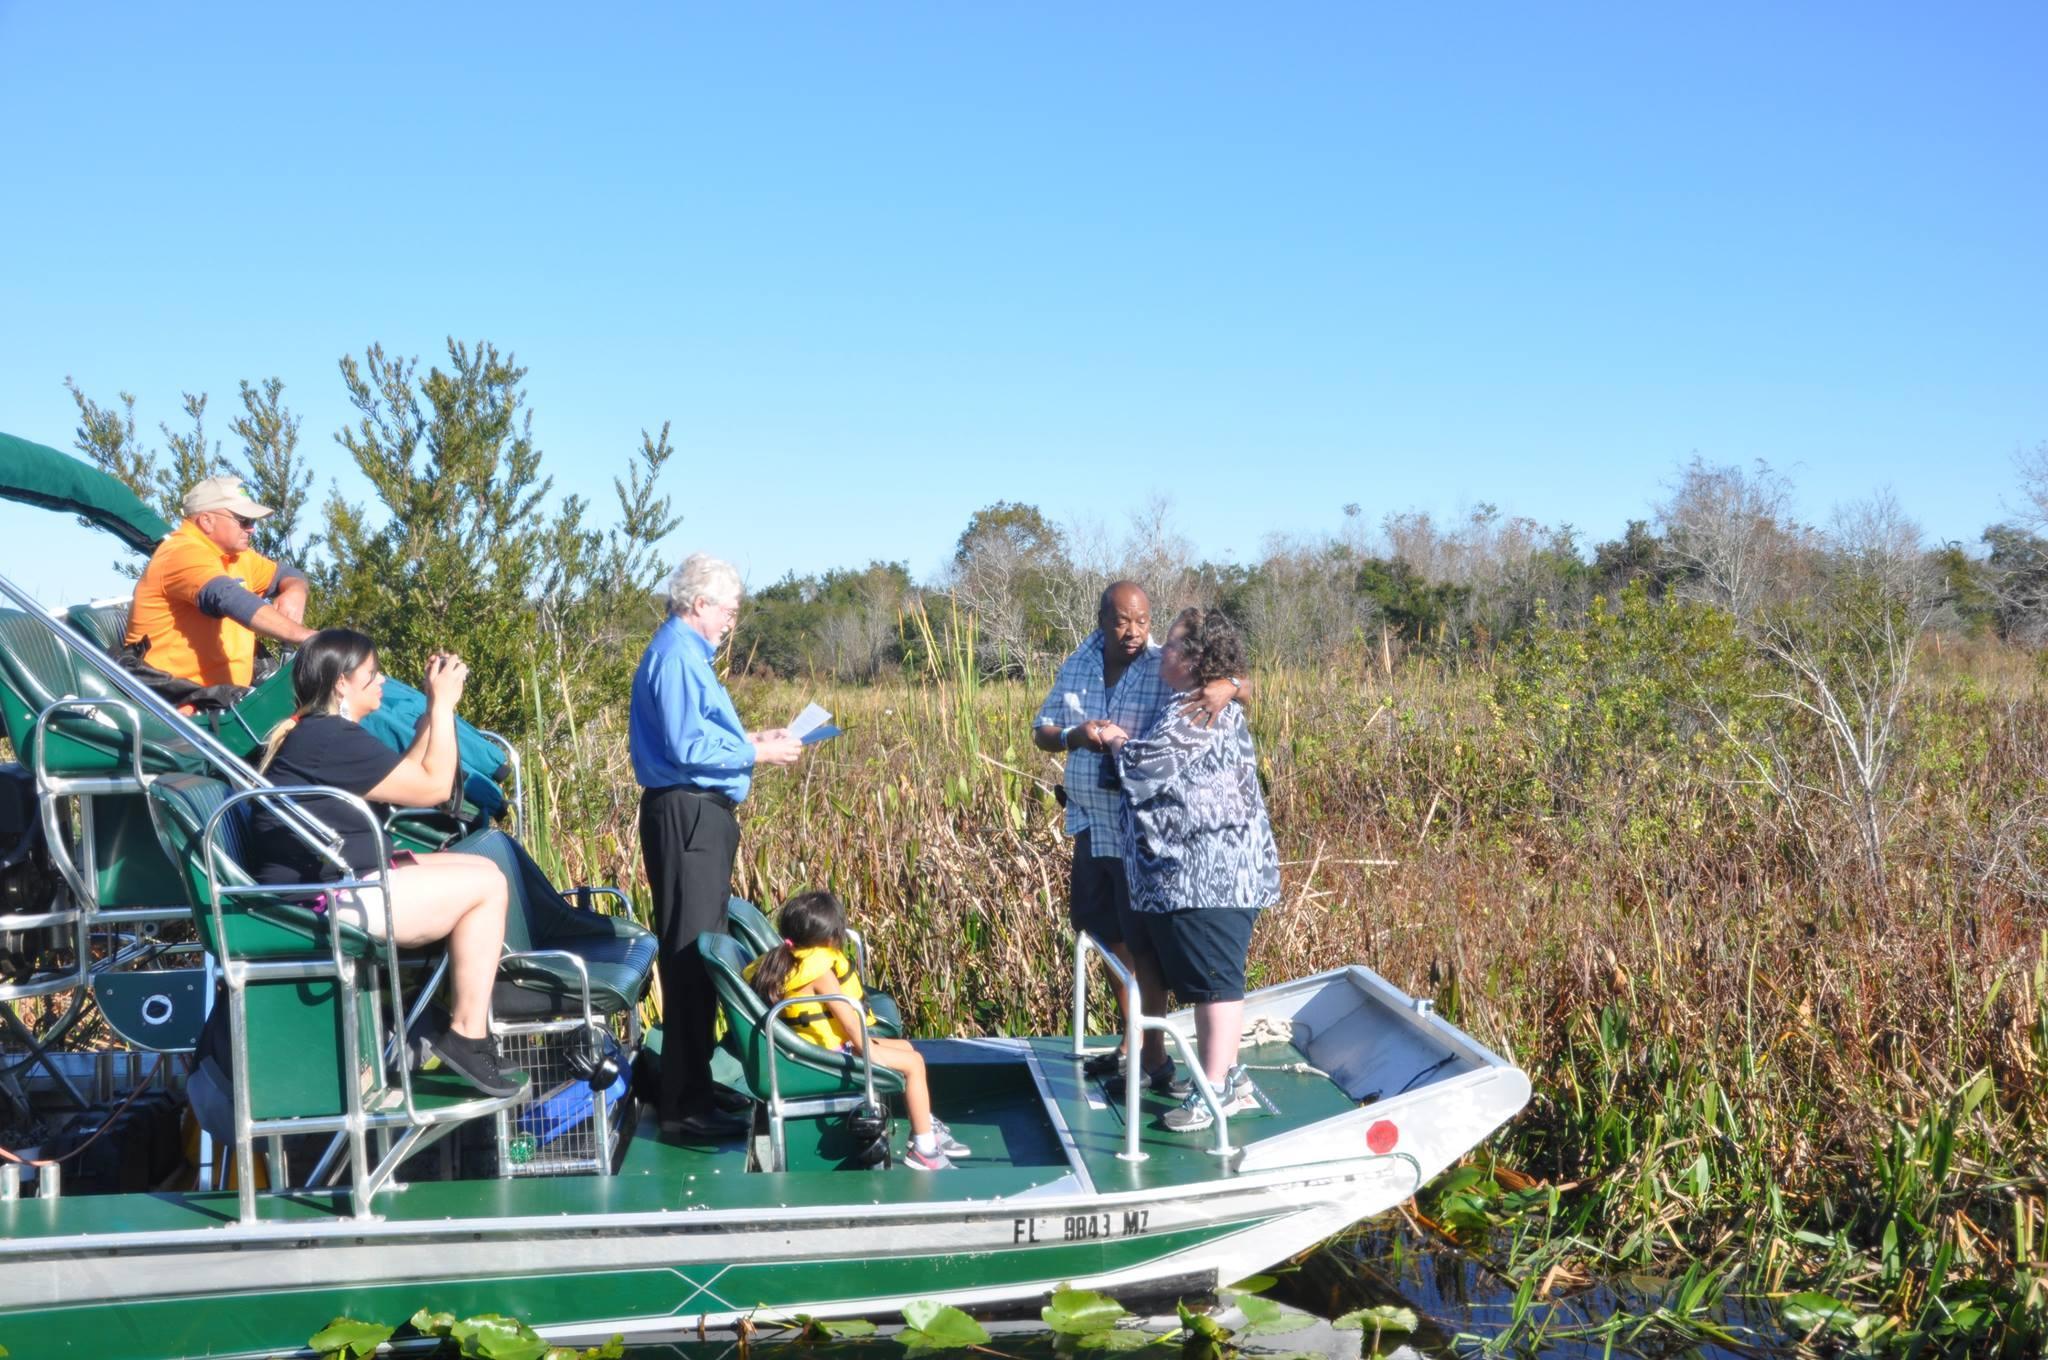 Marsh Landing Adventures Airboat